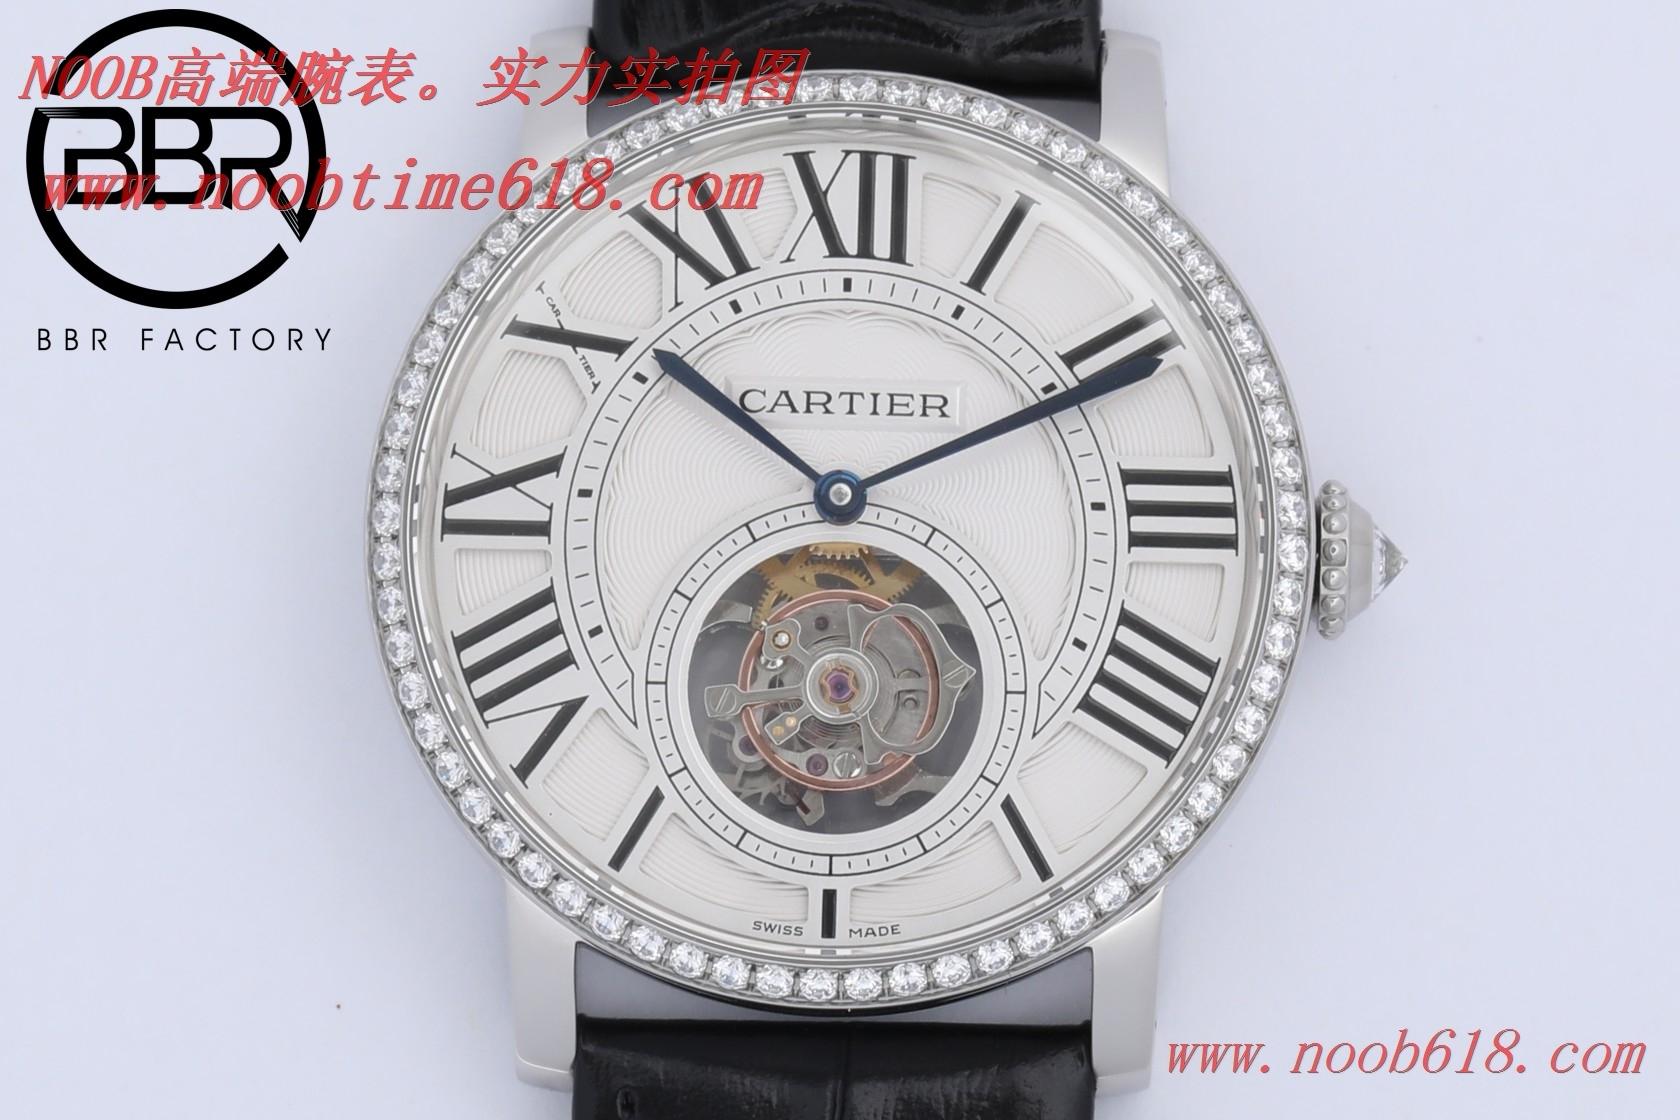 仿錶,精仿手錶,REPLICA WATCH BBR factory卡地亞ROTONDE DE CARTER 系列型號:HPI00593,N廠手錶